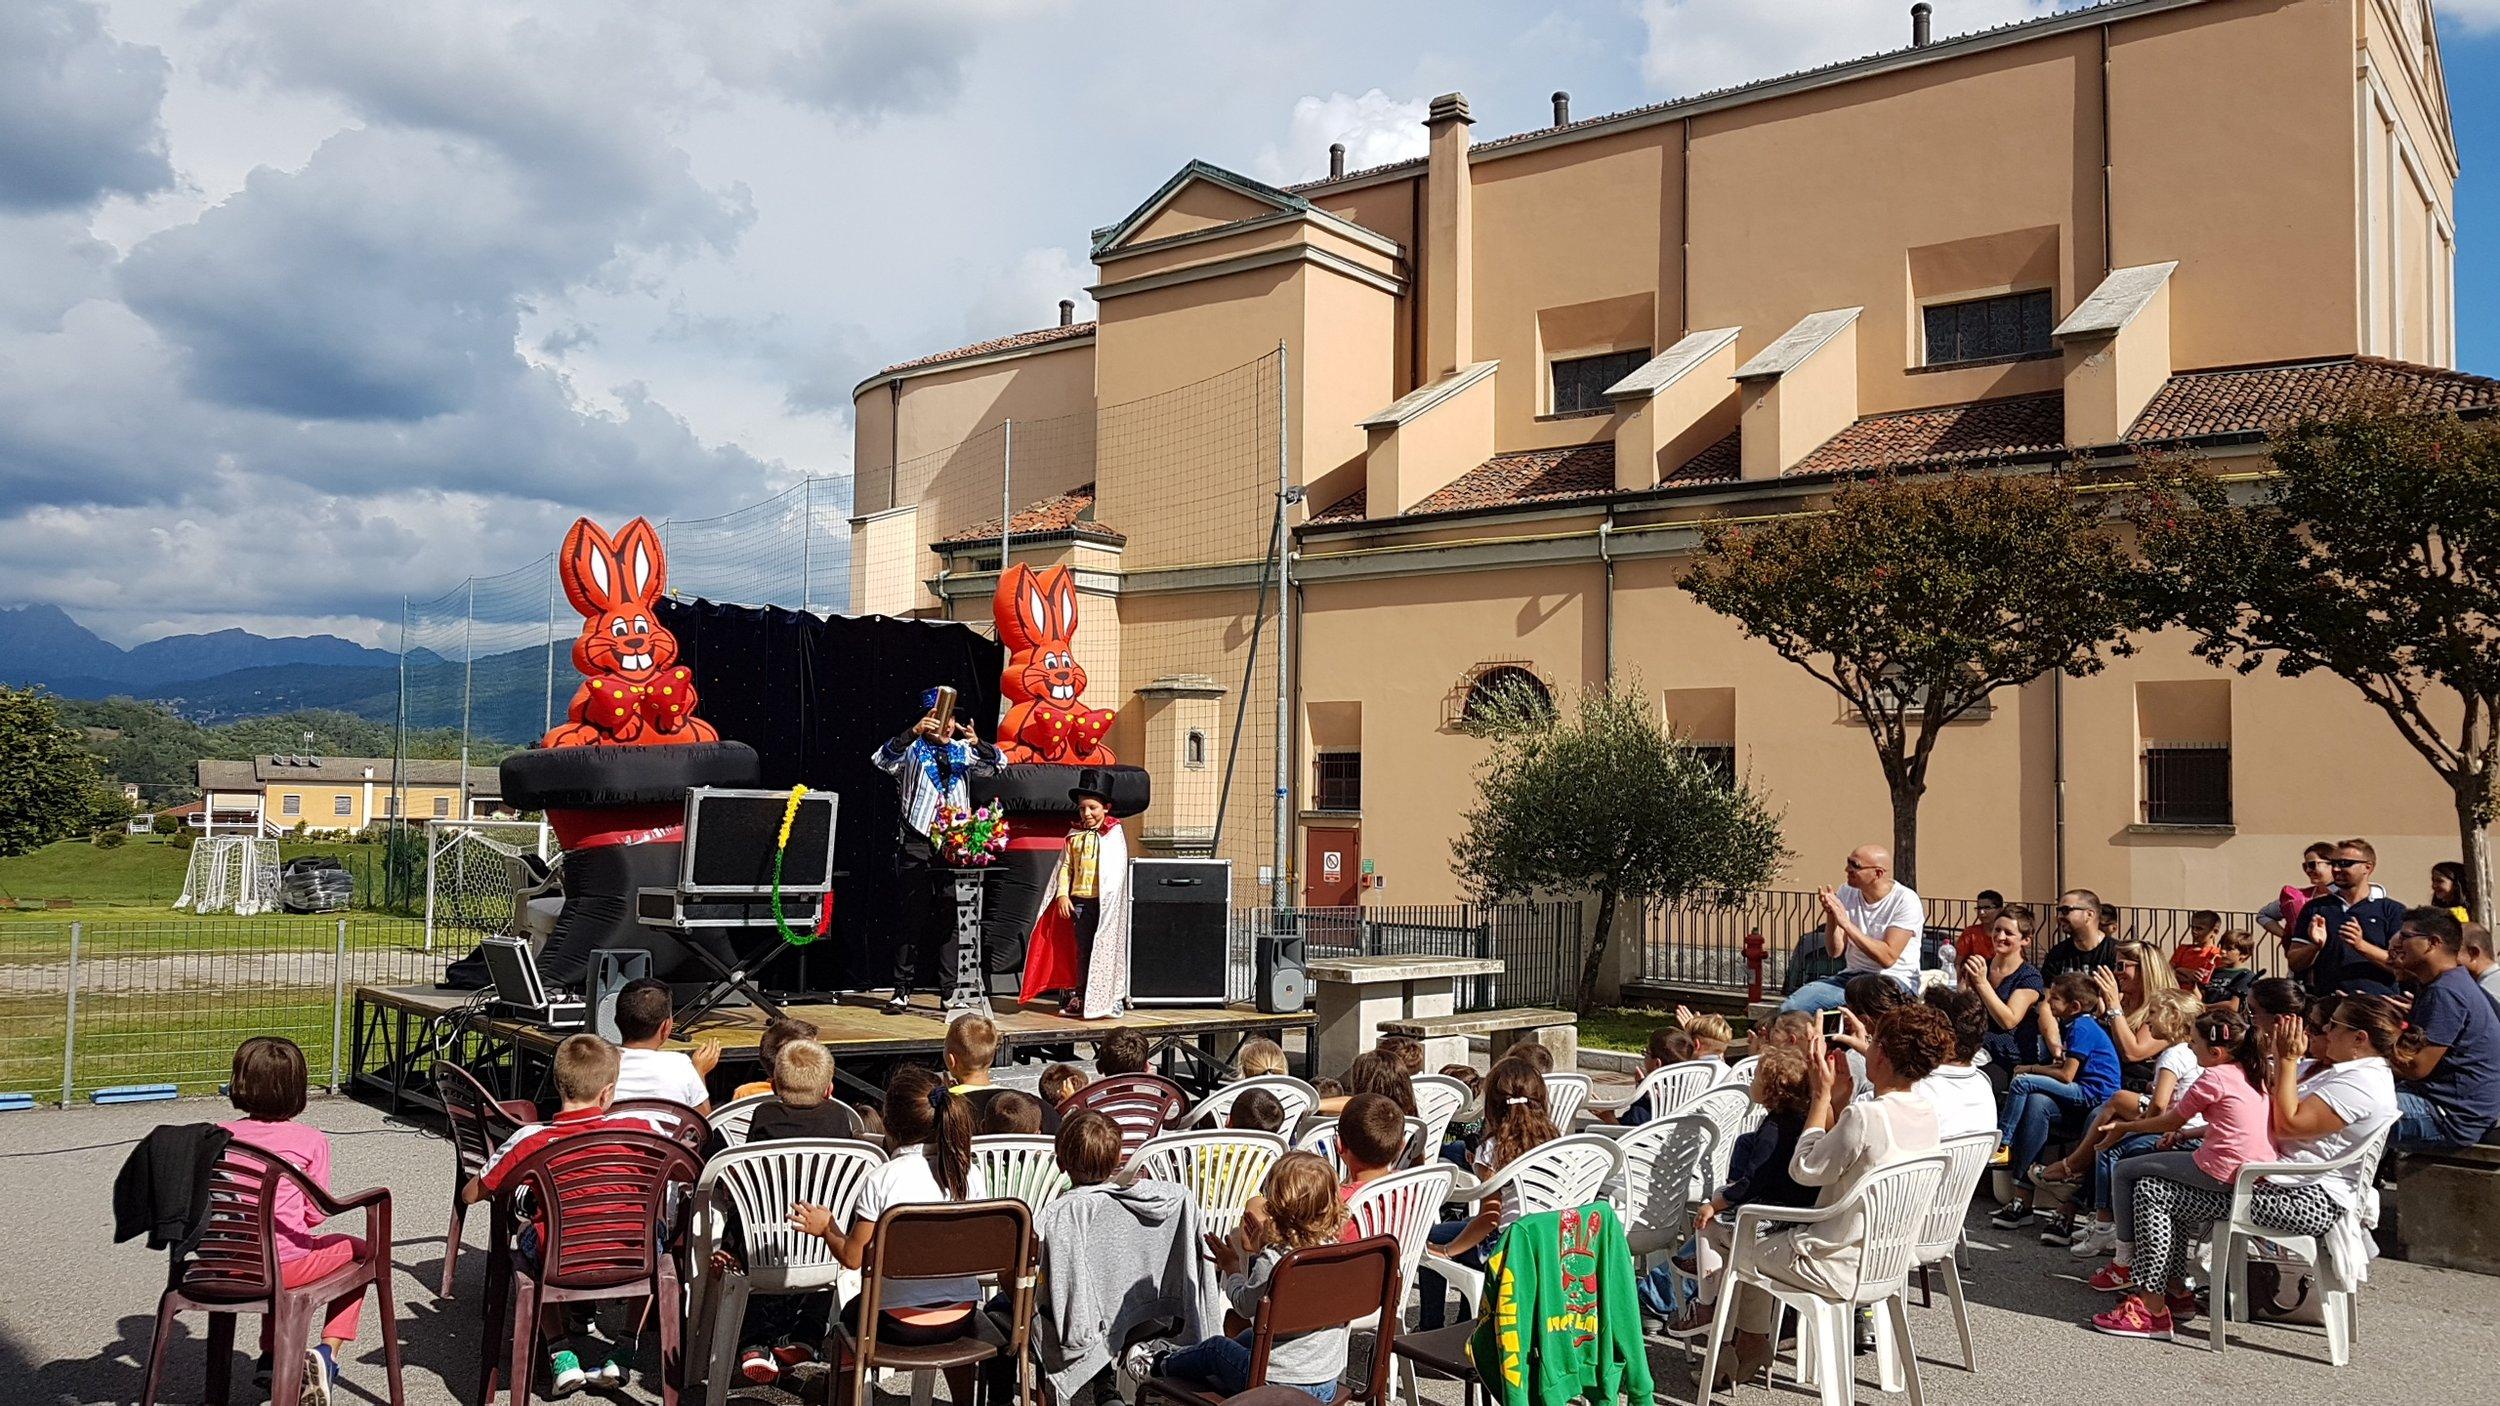 Festa di S. Bernardo 2017 (7).jpg